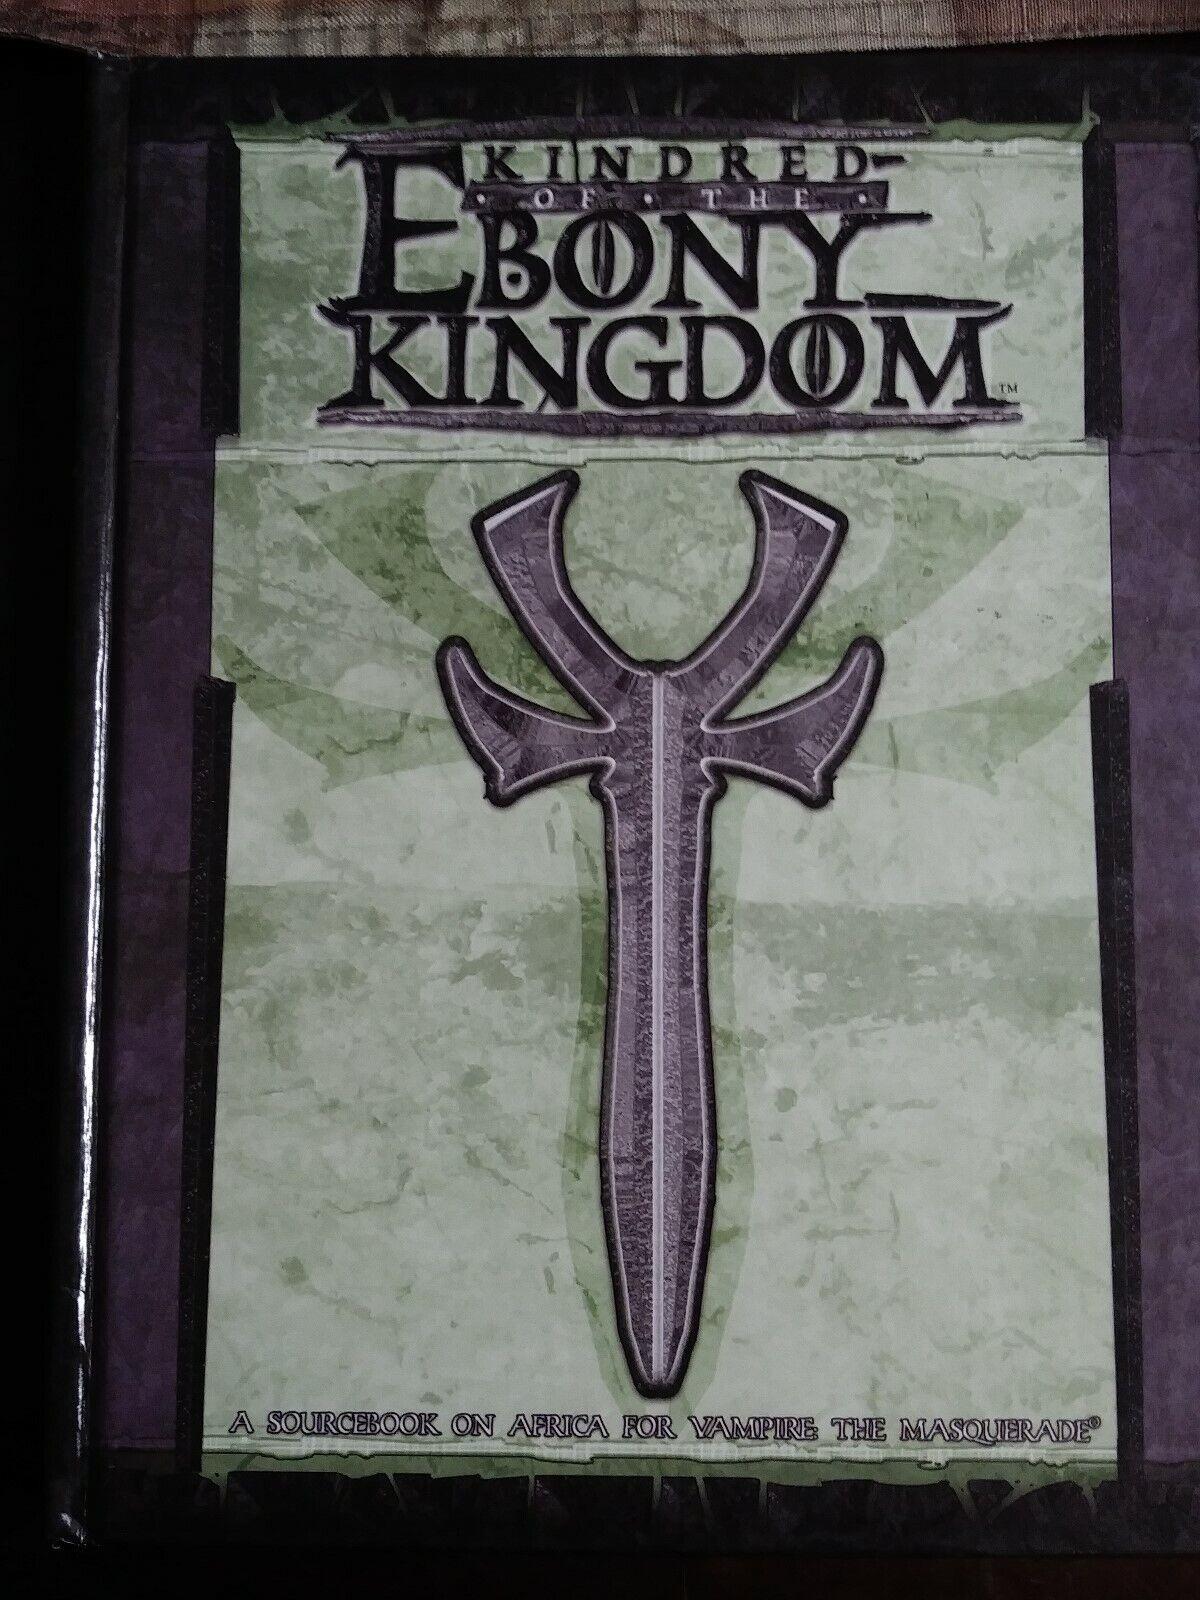 White Wolf Vampire The Masquerade Kindred of the Ebony Kingdom